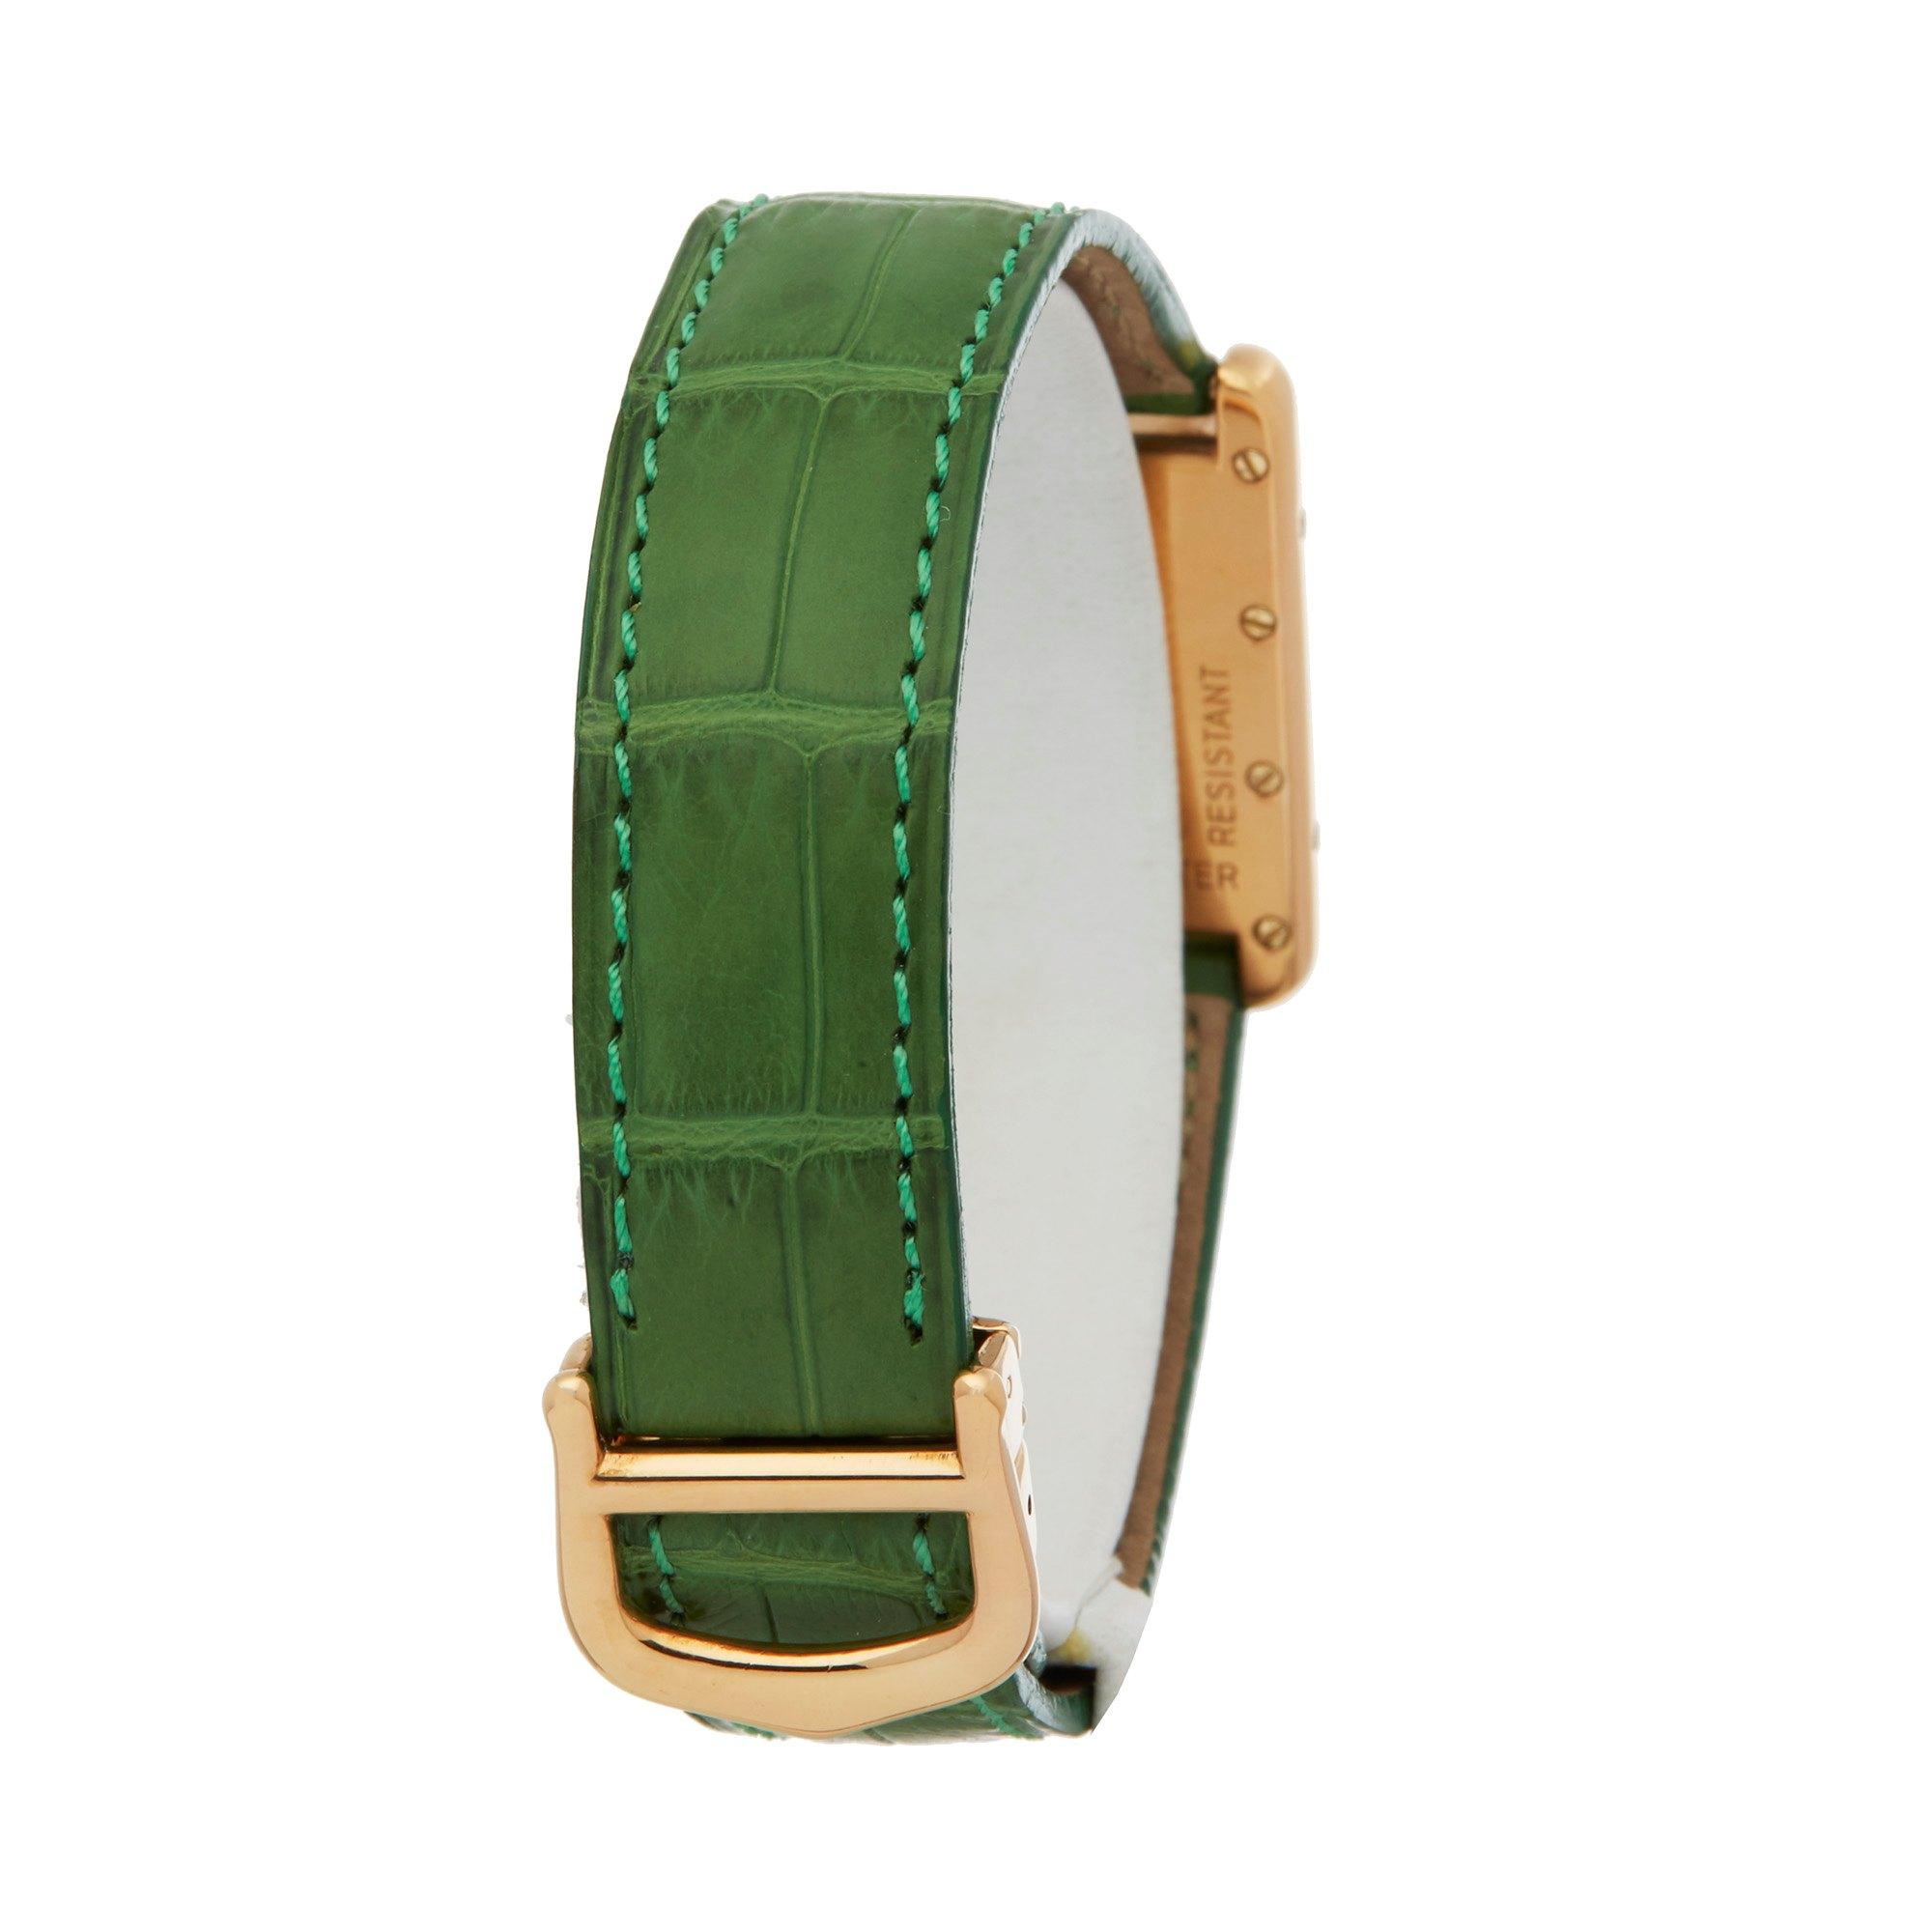 Cartier Must de Cartier 2415 Men Gold Plated Watch - Image 5 of 6